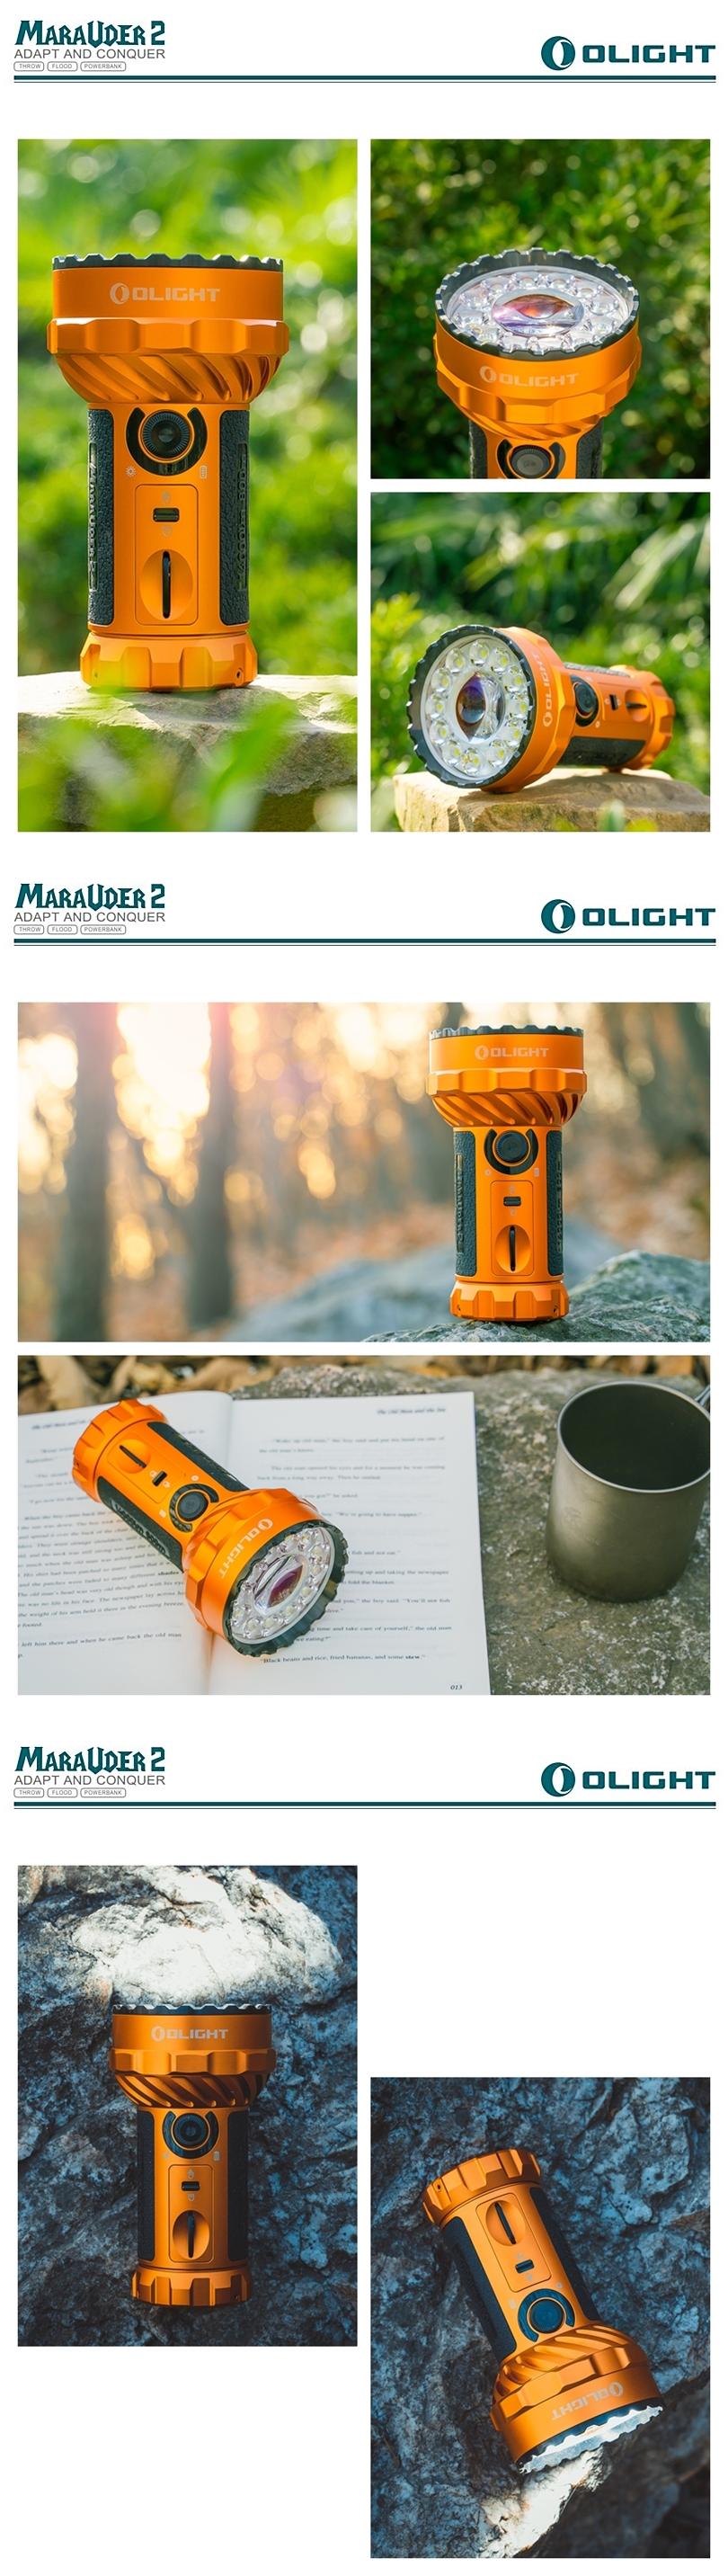 OLIGHT Marauder 2 橘 Orange 遠射搜索強光LED手電筒 遠近雙光 14000 流明 轉盤調光 USB-C充電 可當行動電源    (4)